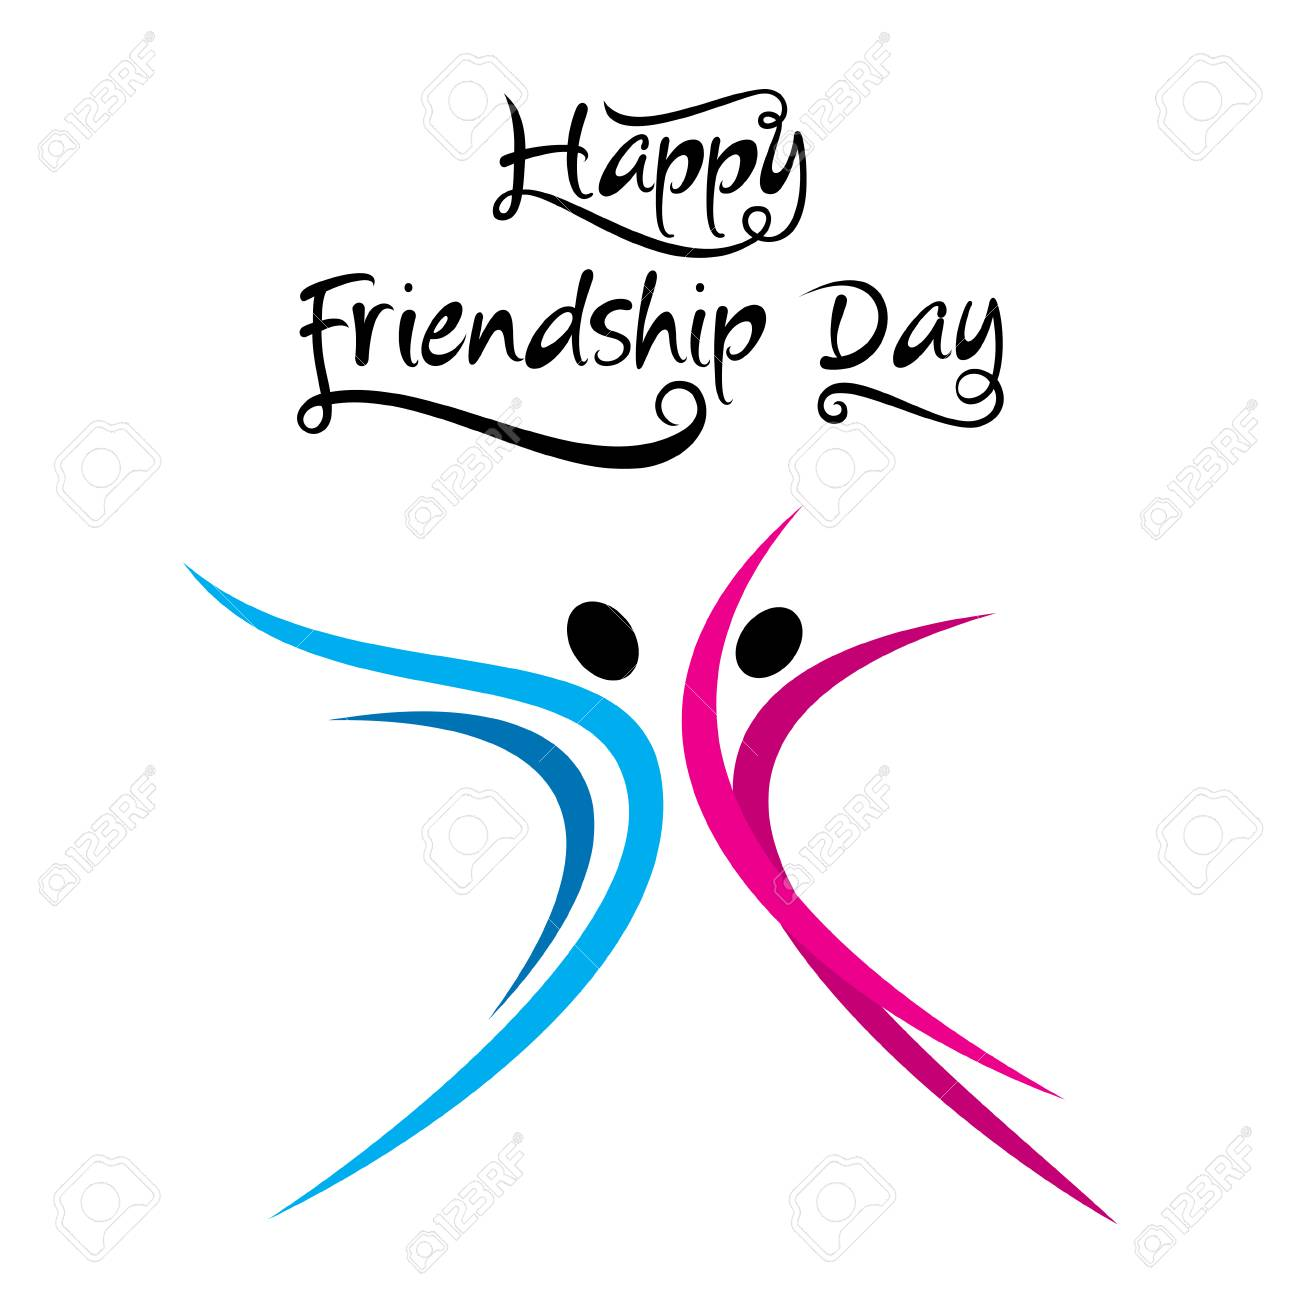 Happy Friendship Day Poster Design Stock Vector